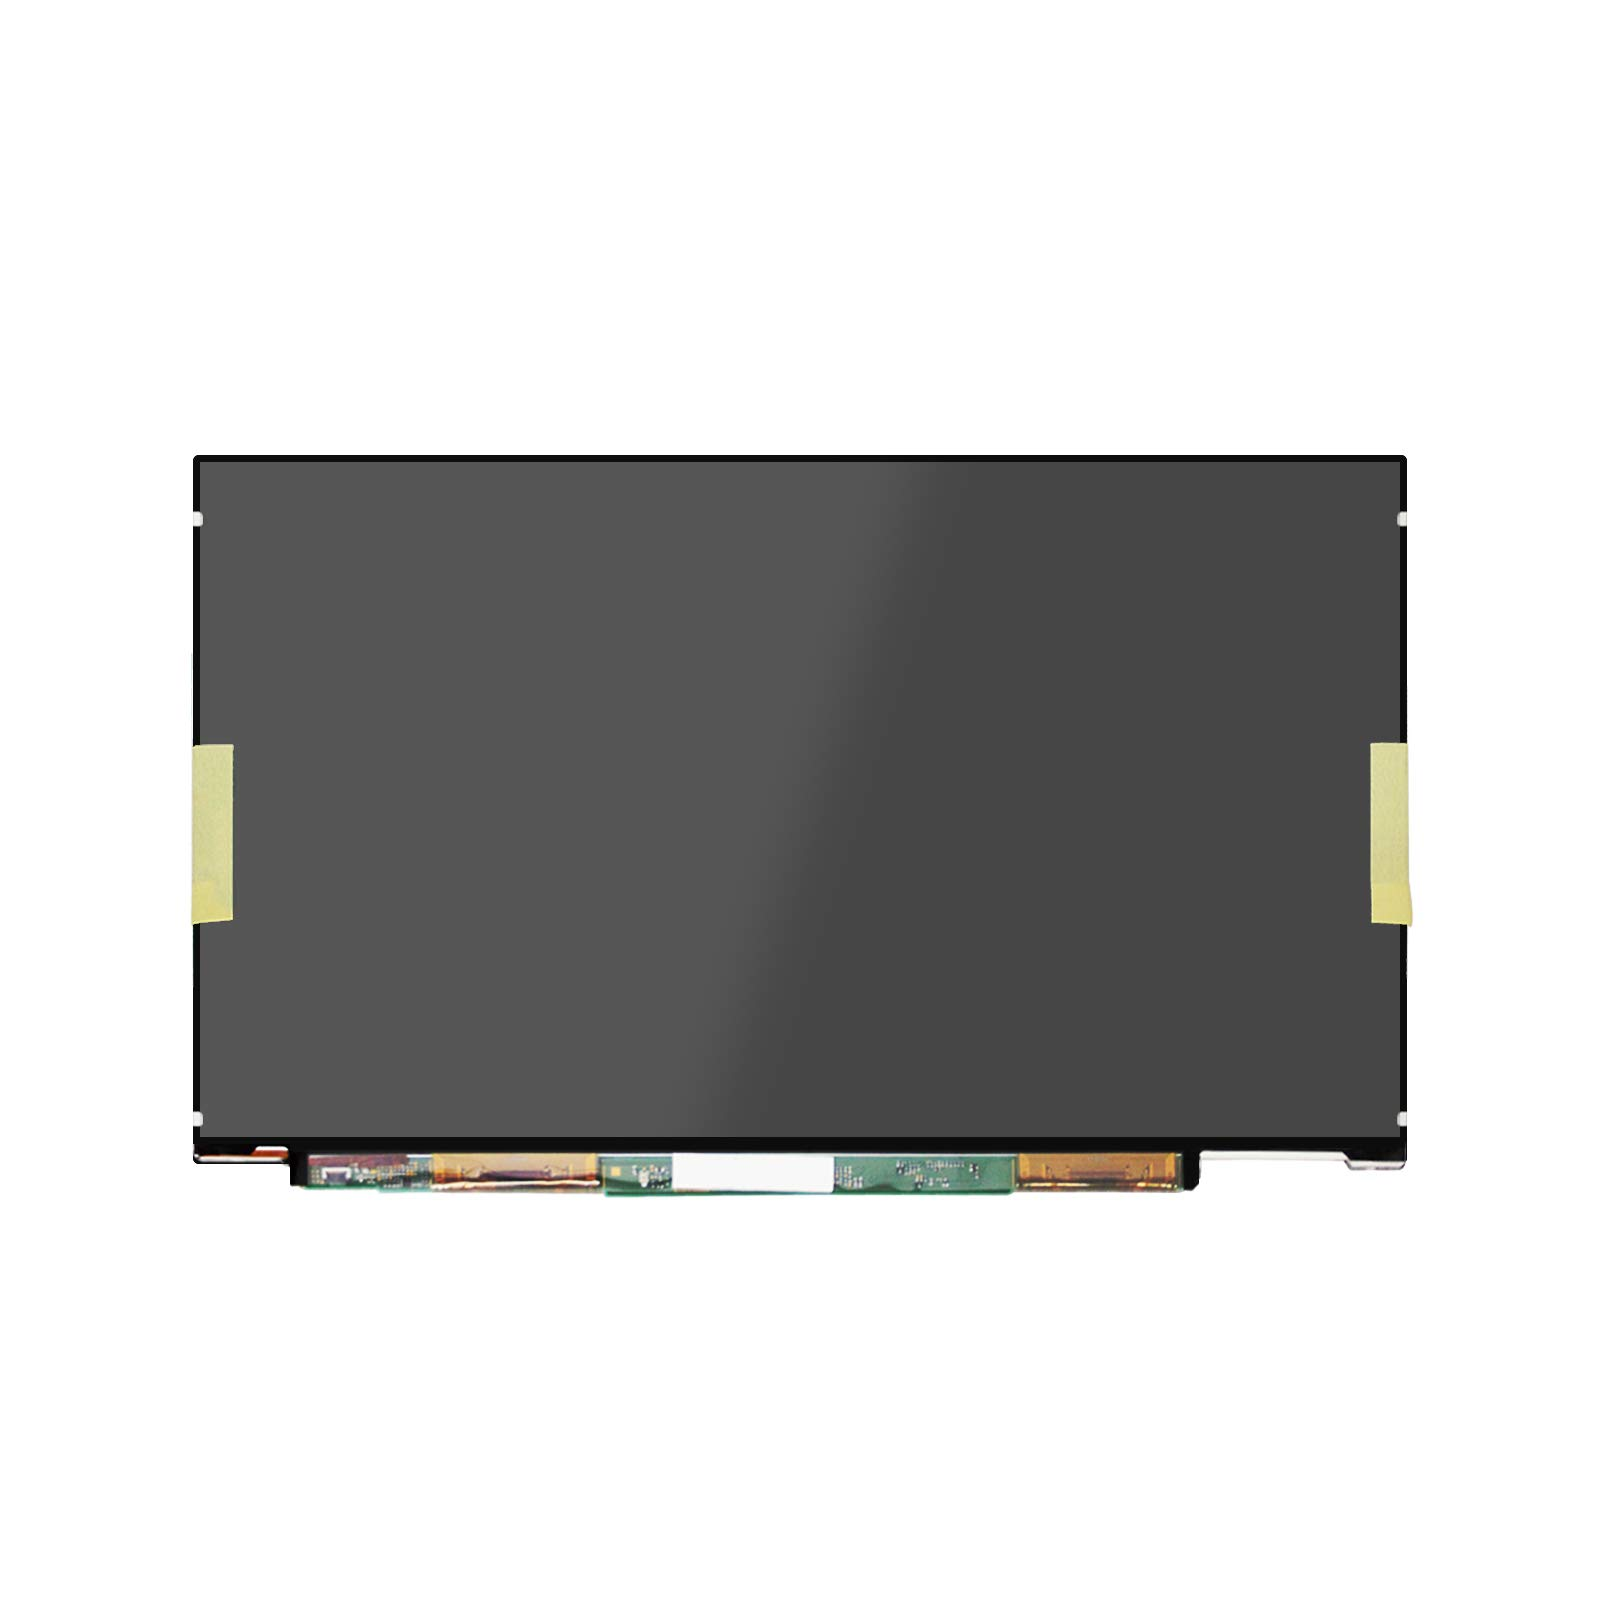 FTDLCD® 13.1 Inch LED LCD Panel Pantalla de Visualización Repuesto de Pantalla de Ordenador para LTD131EWSX LTD131EQSX 1366x768 30 Pin: Amazon.es: Electrónica